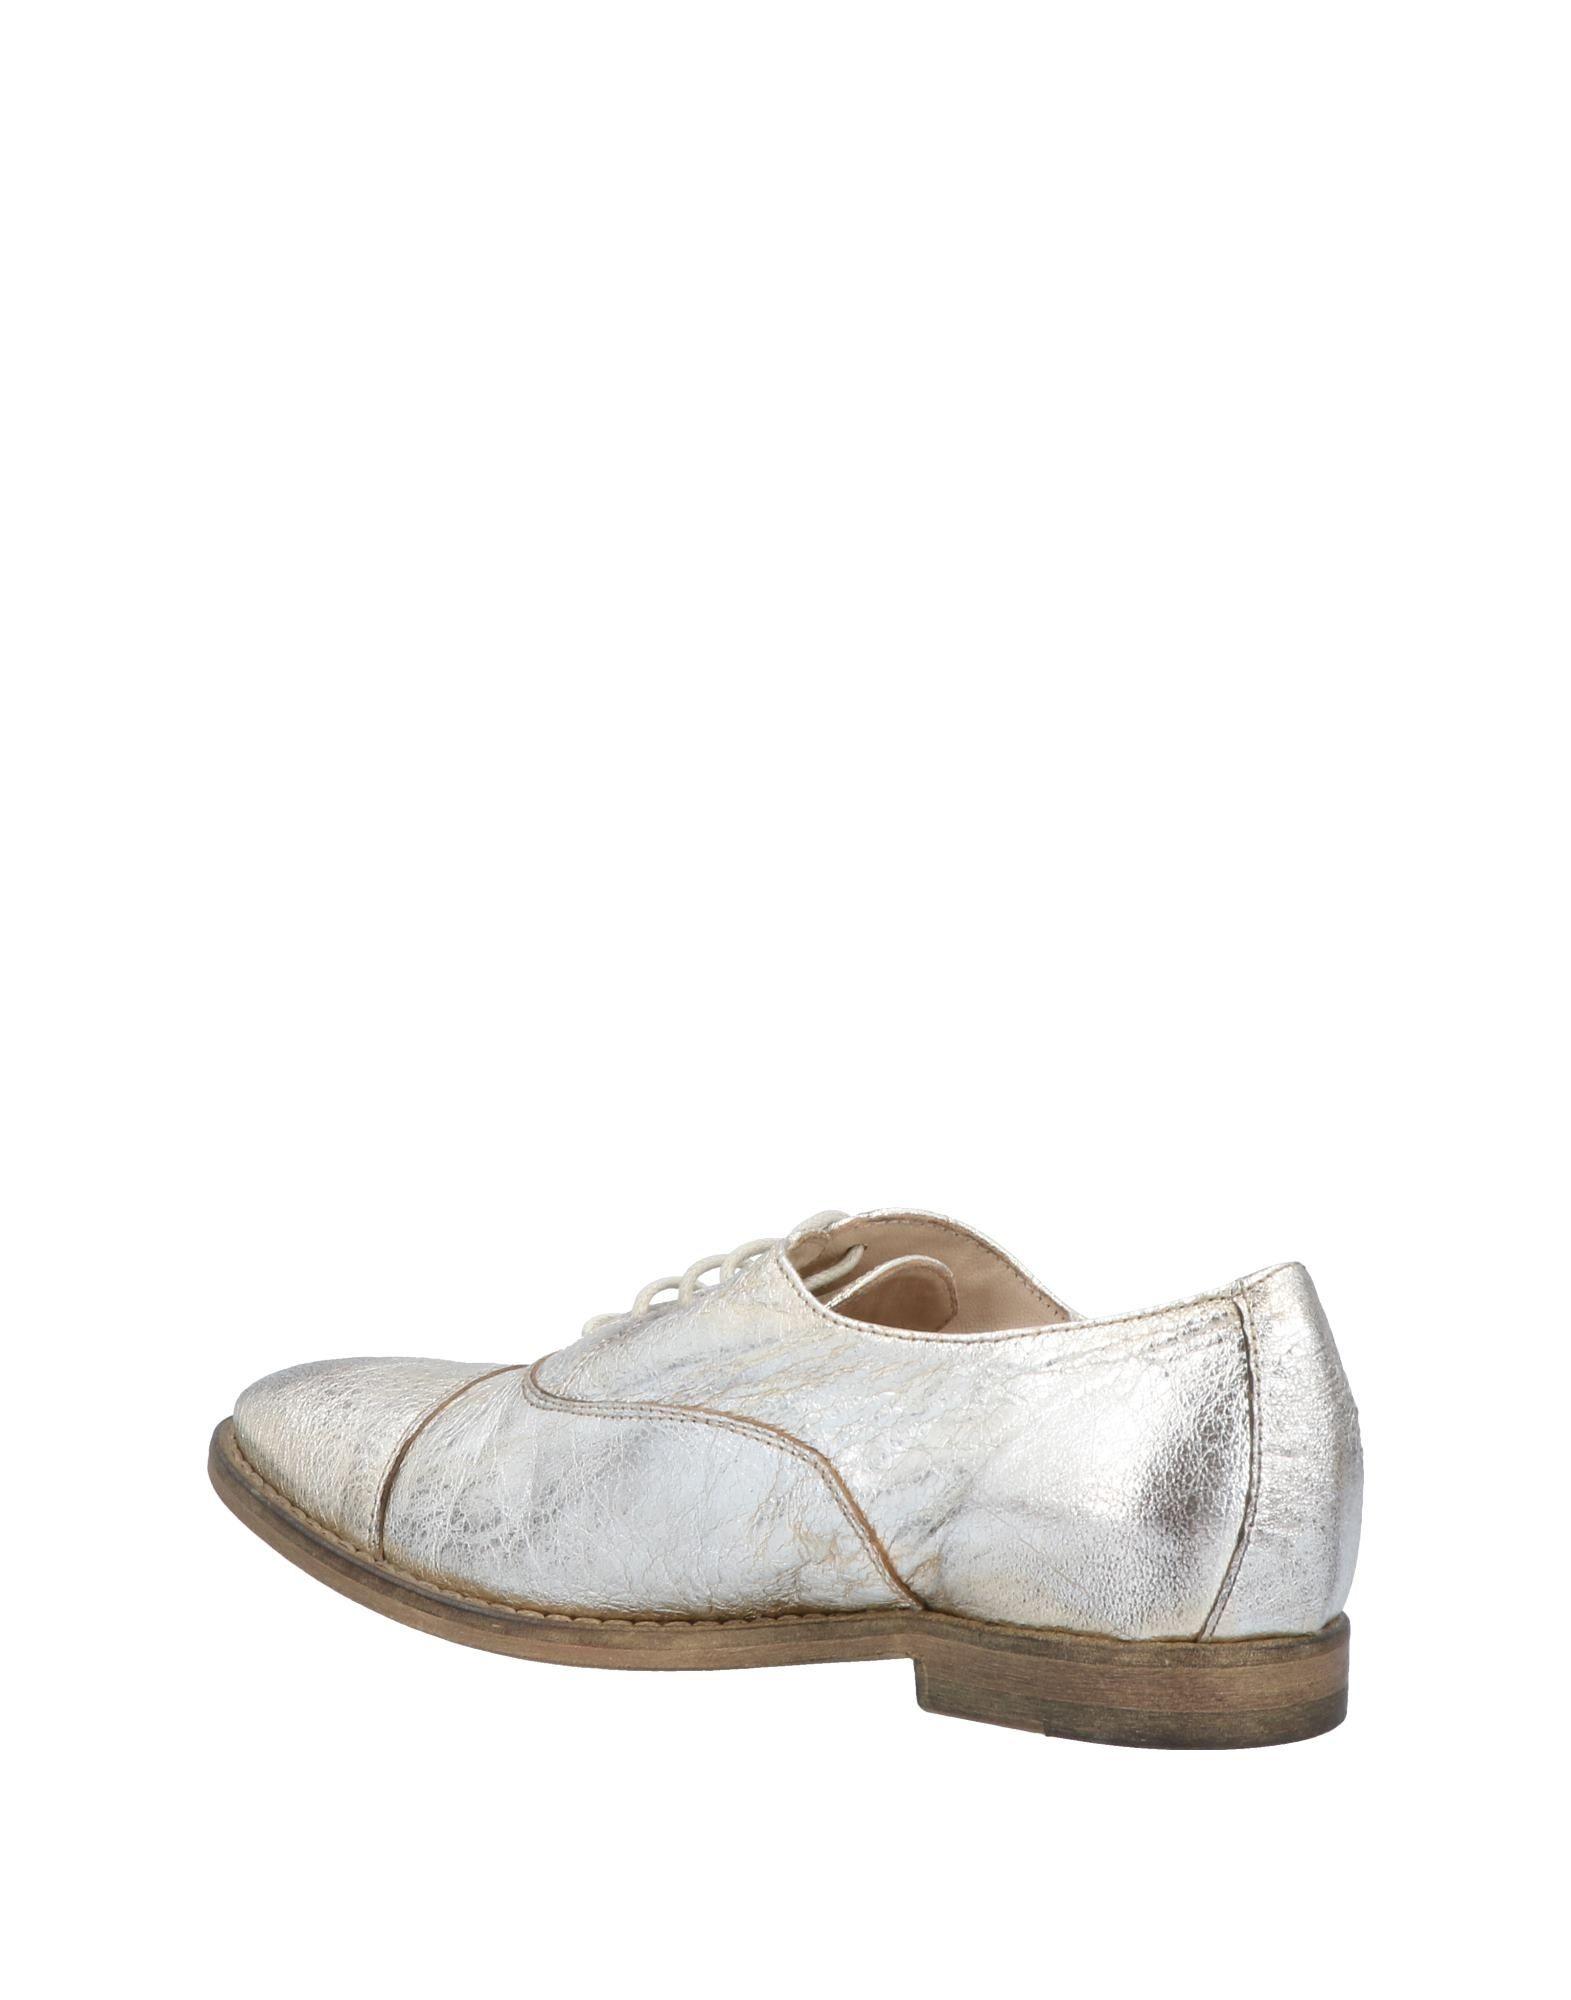 Chaussures À Lacets Strategia Femme - Chaussures À Lacets Strategia sur